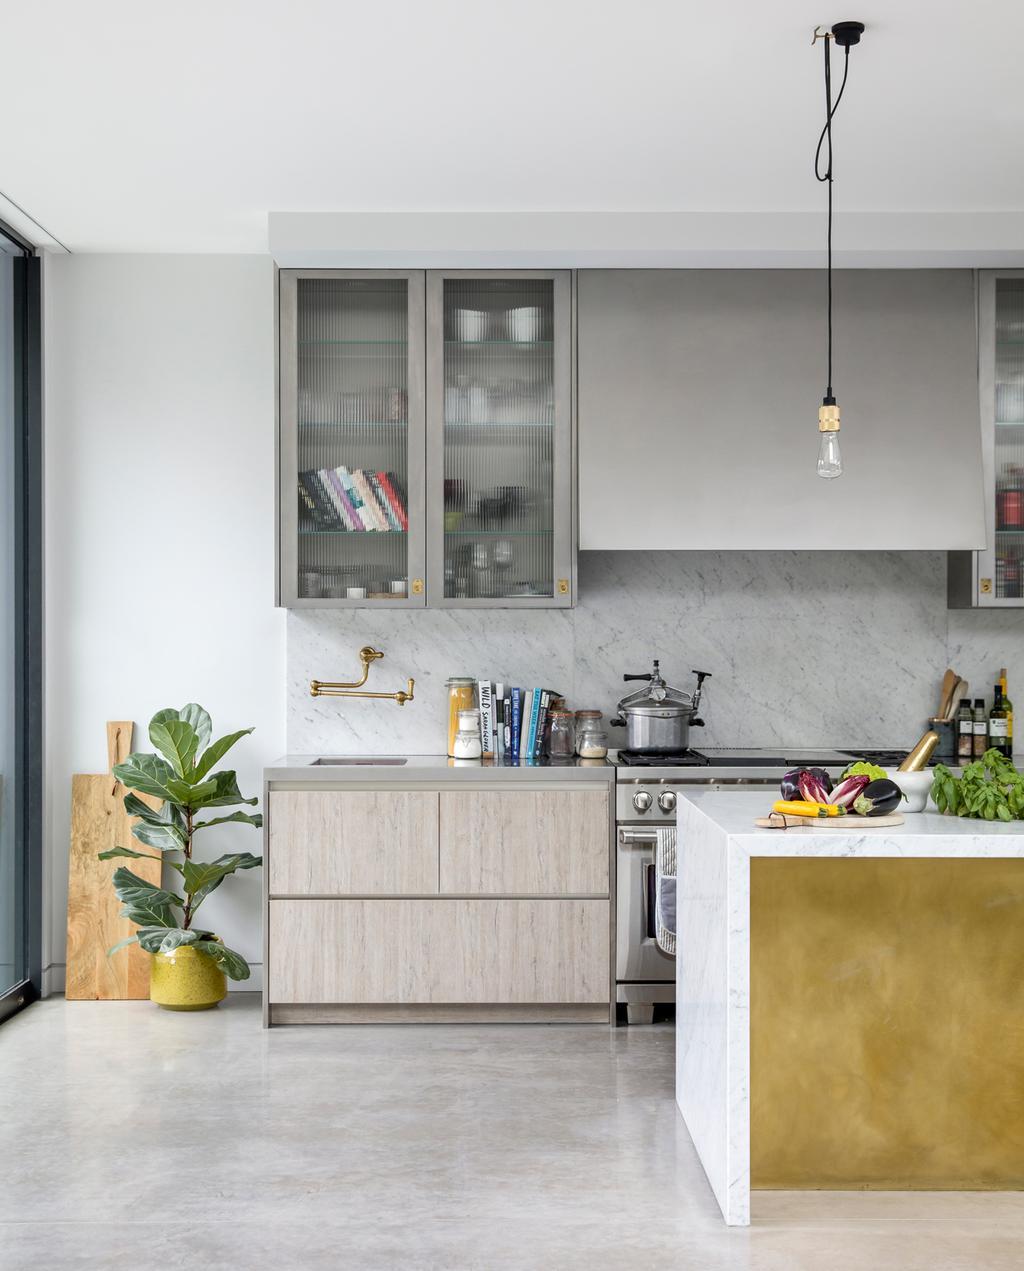 vtwonen 1-2020 | keuken goud keukenblok